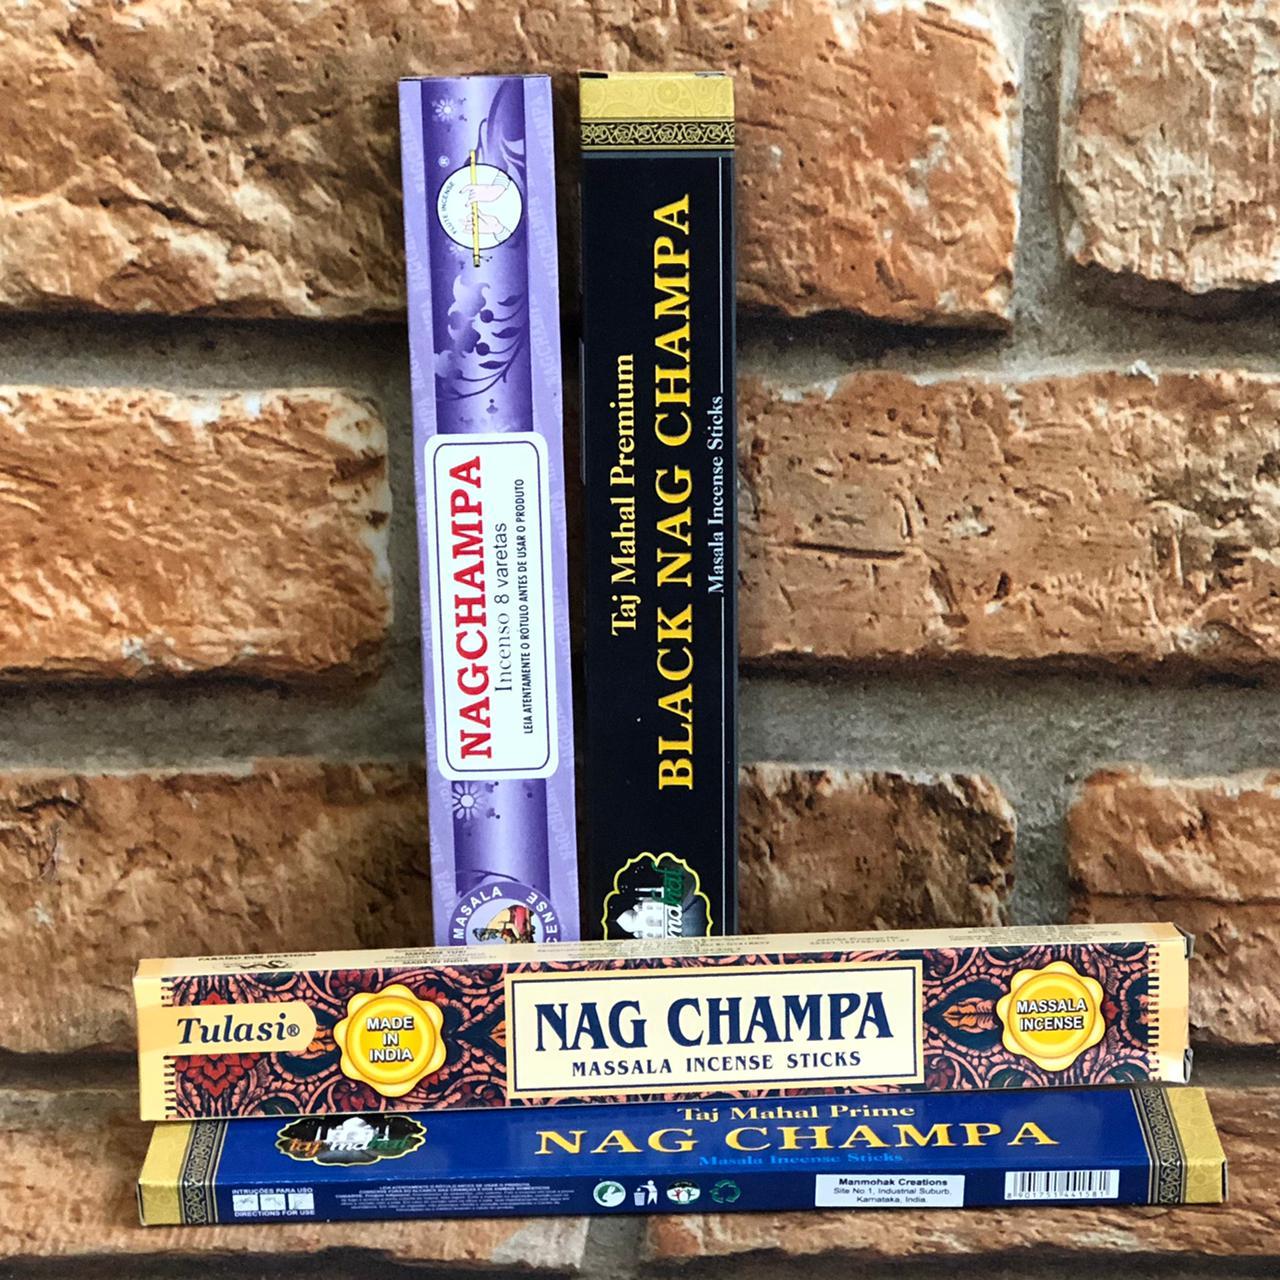 Incenso Nag Champa Masala Sticks